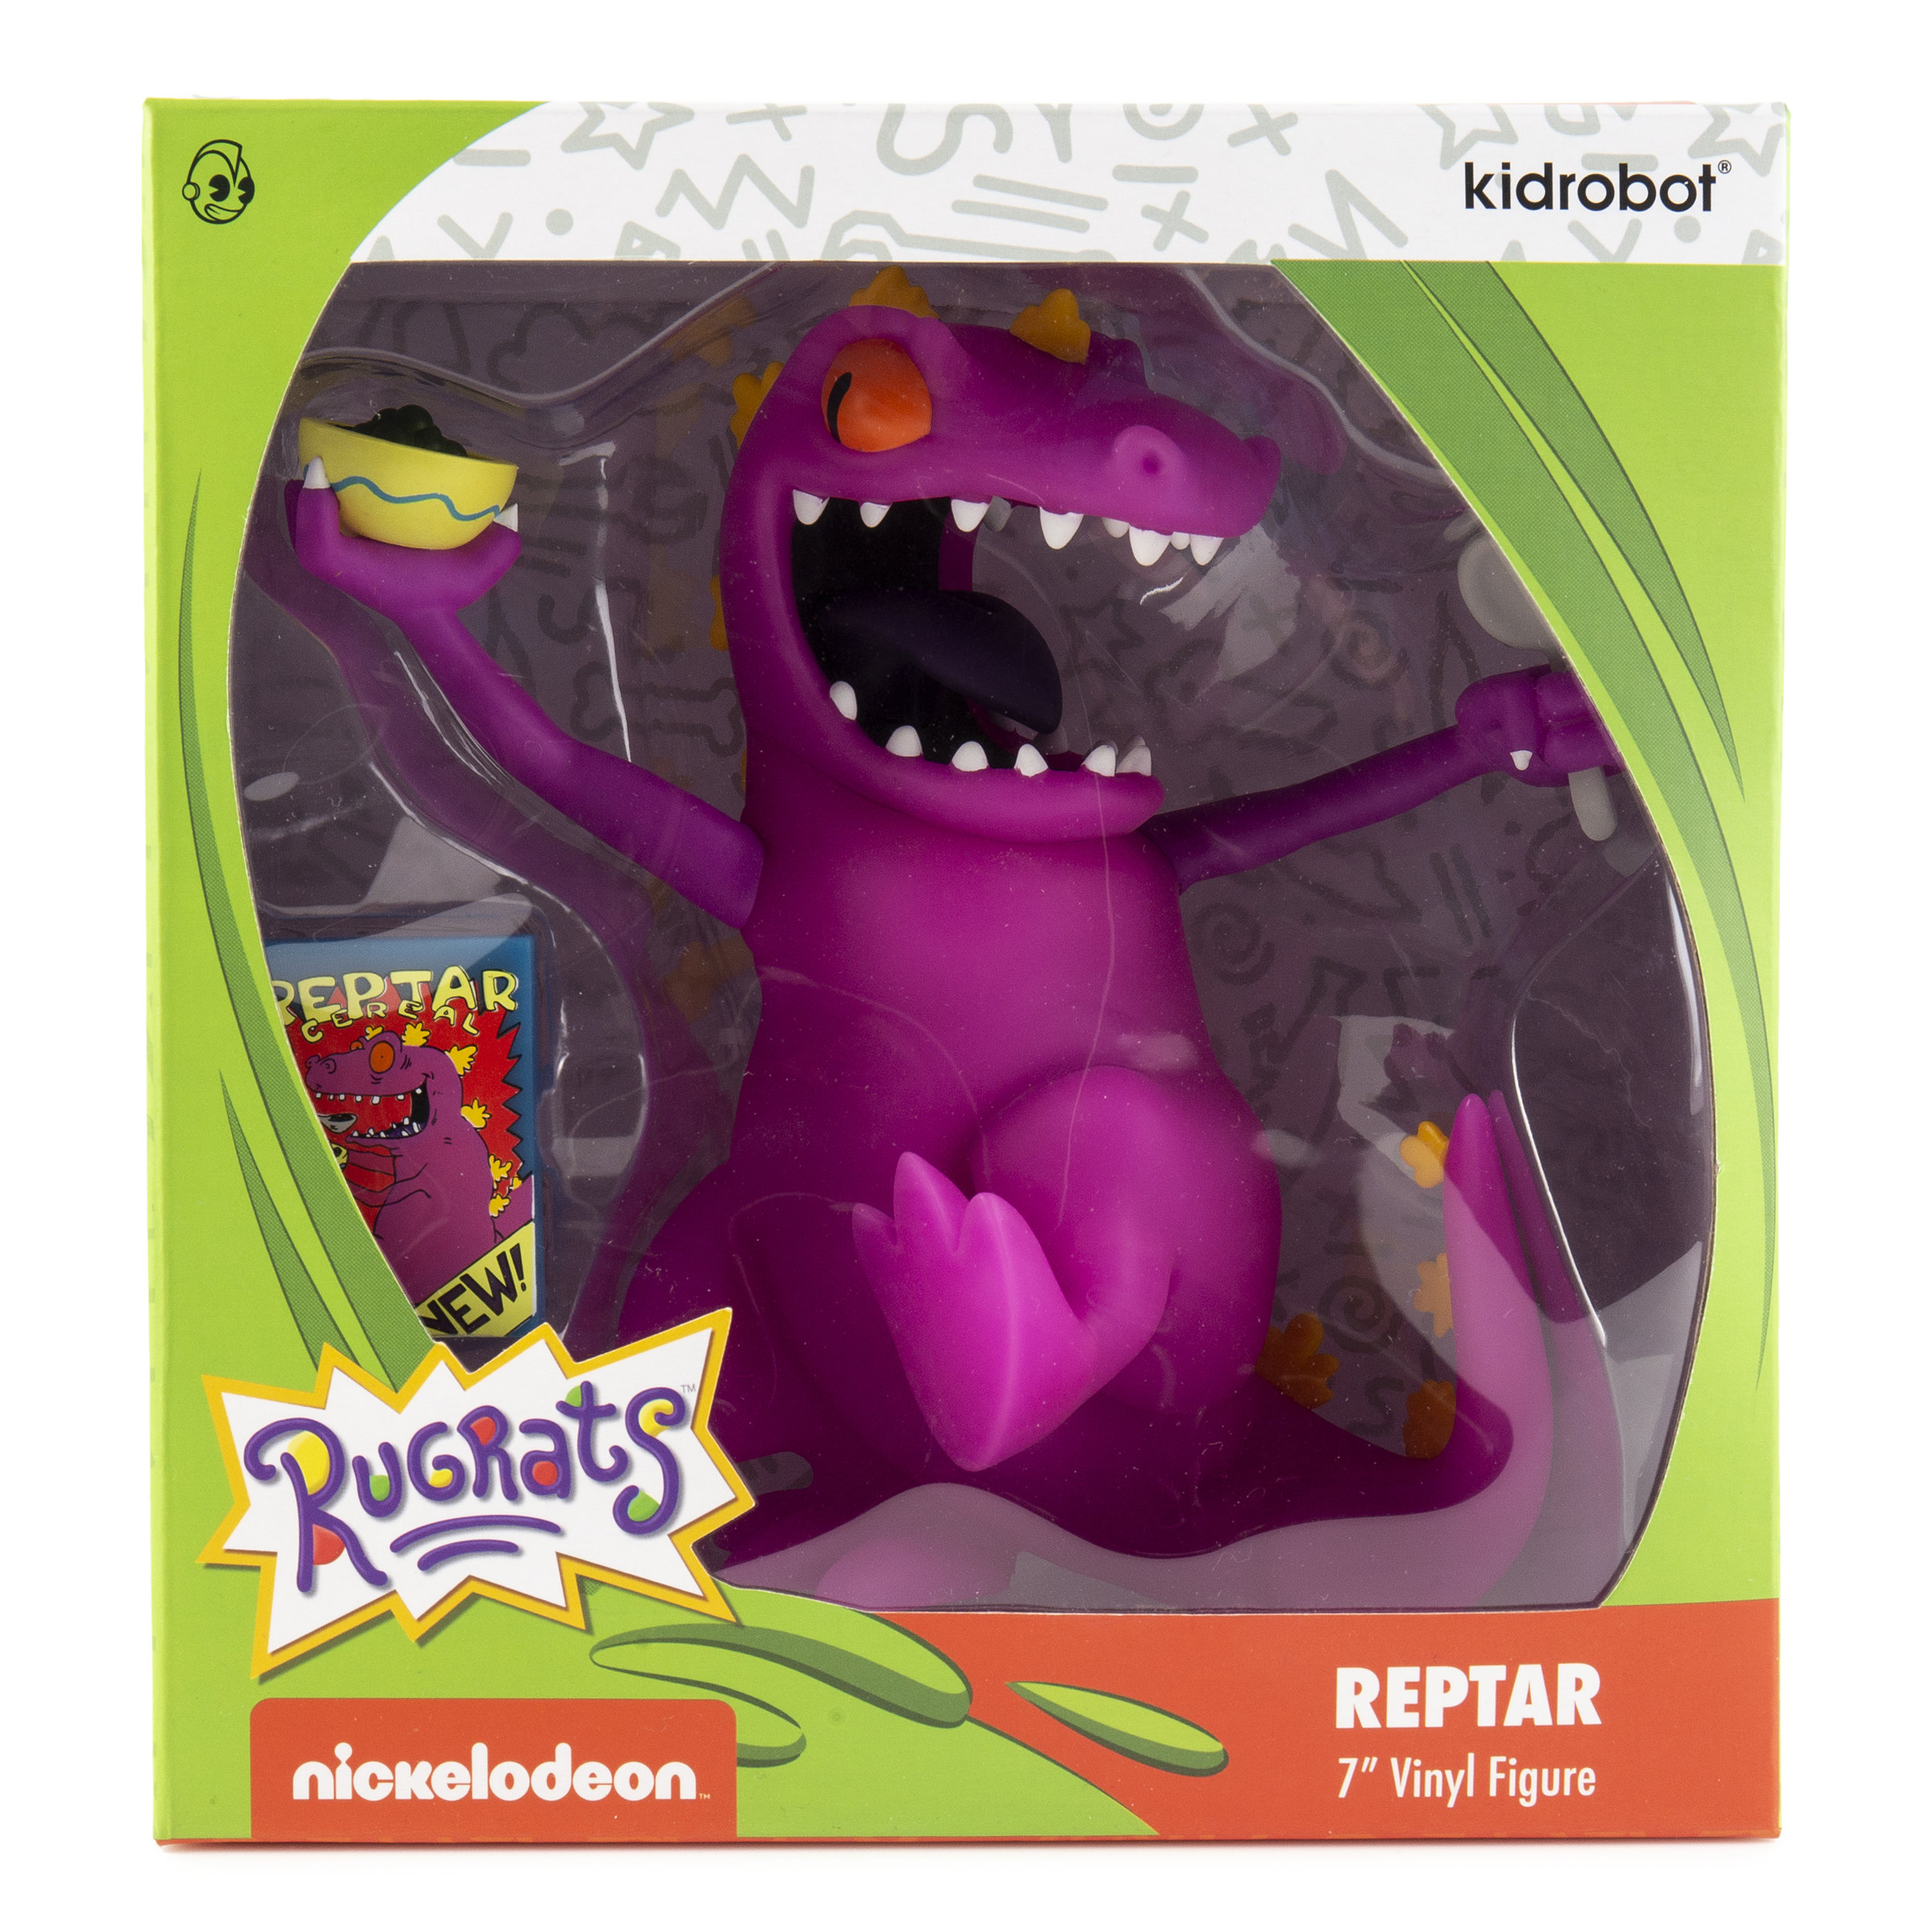 KidRobot Reptar_06.jpg